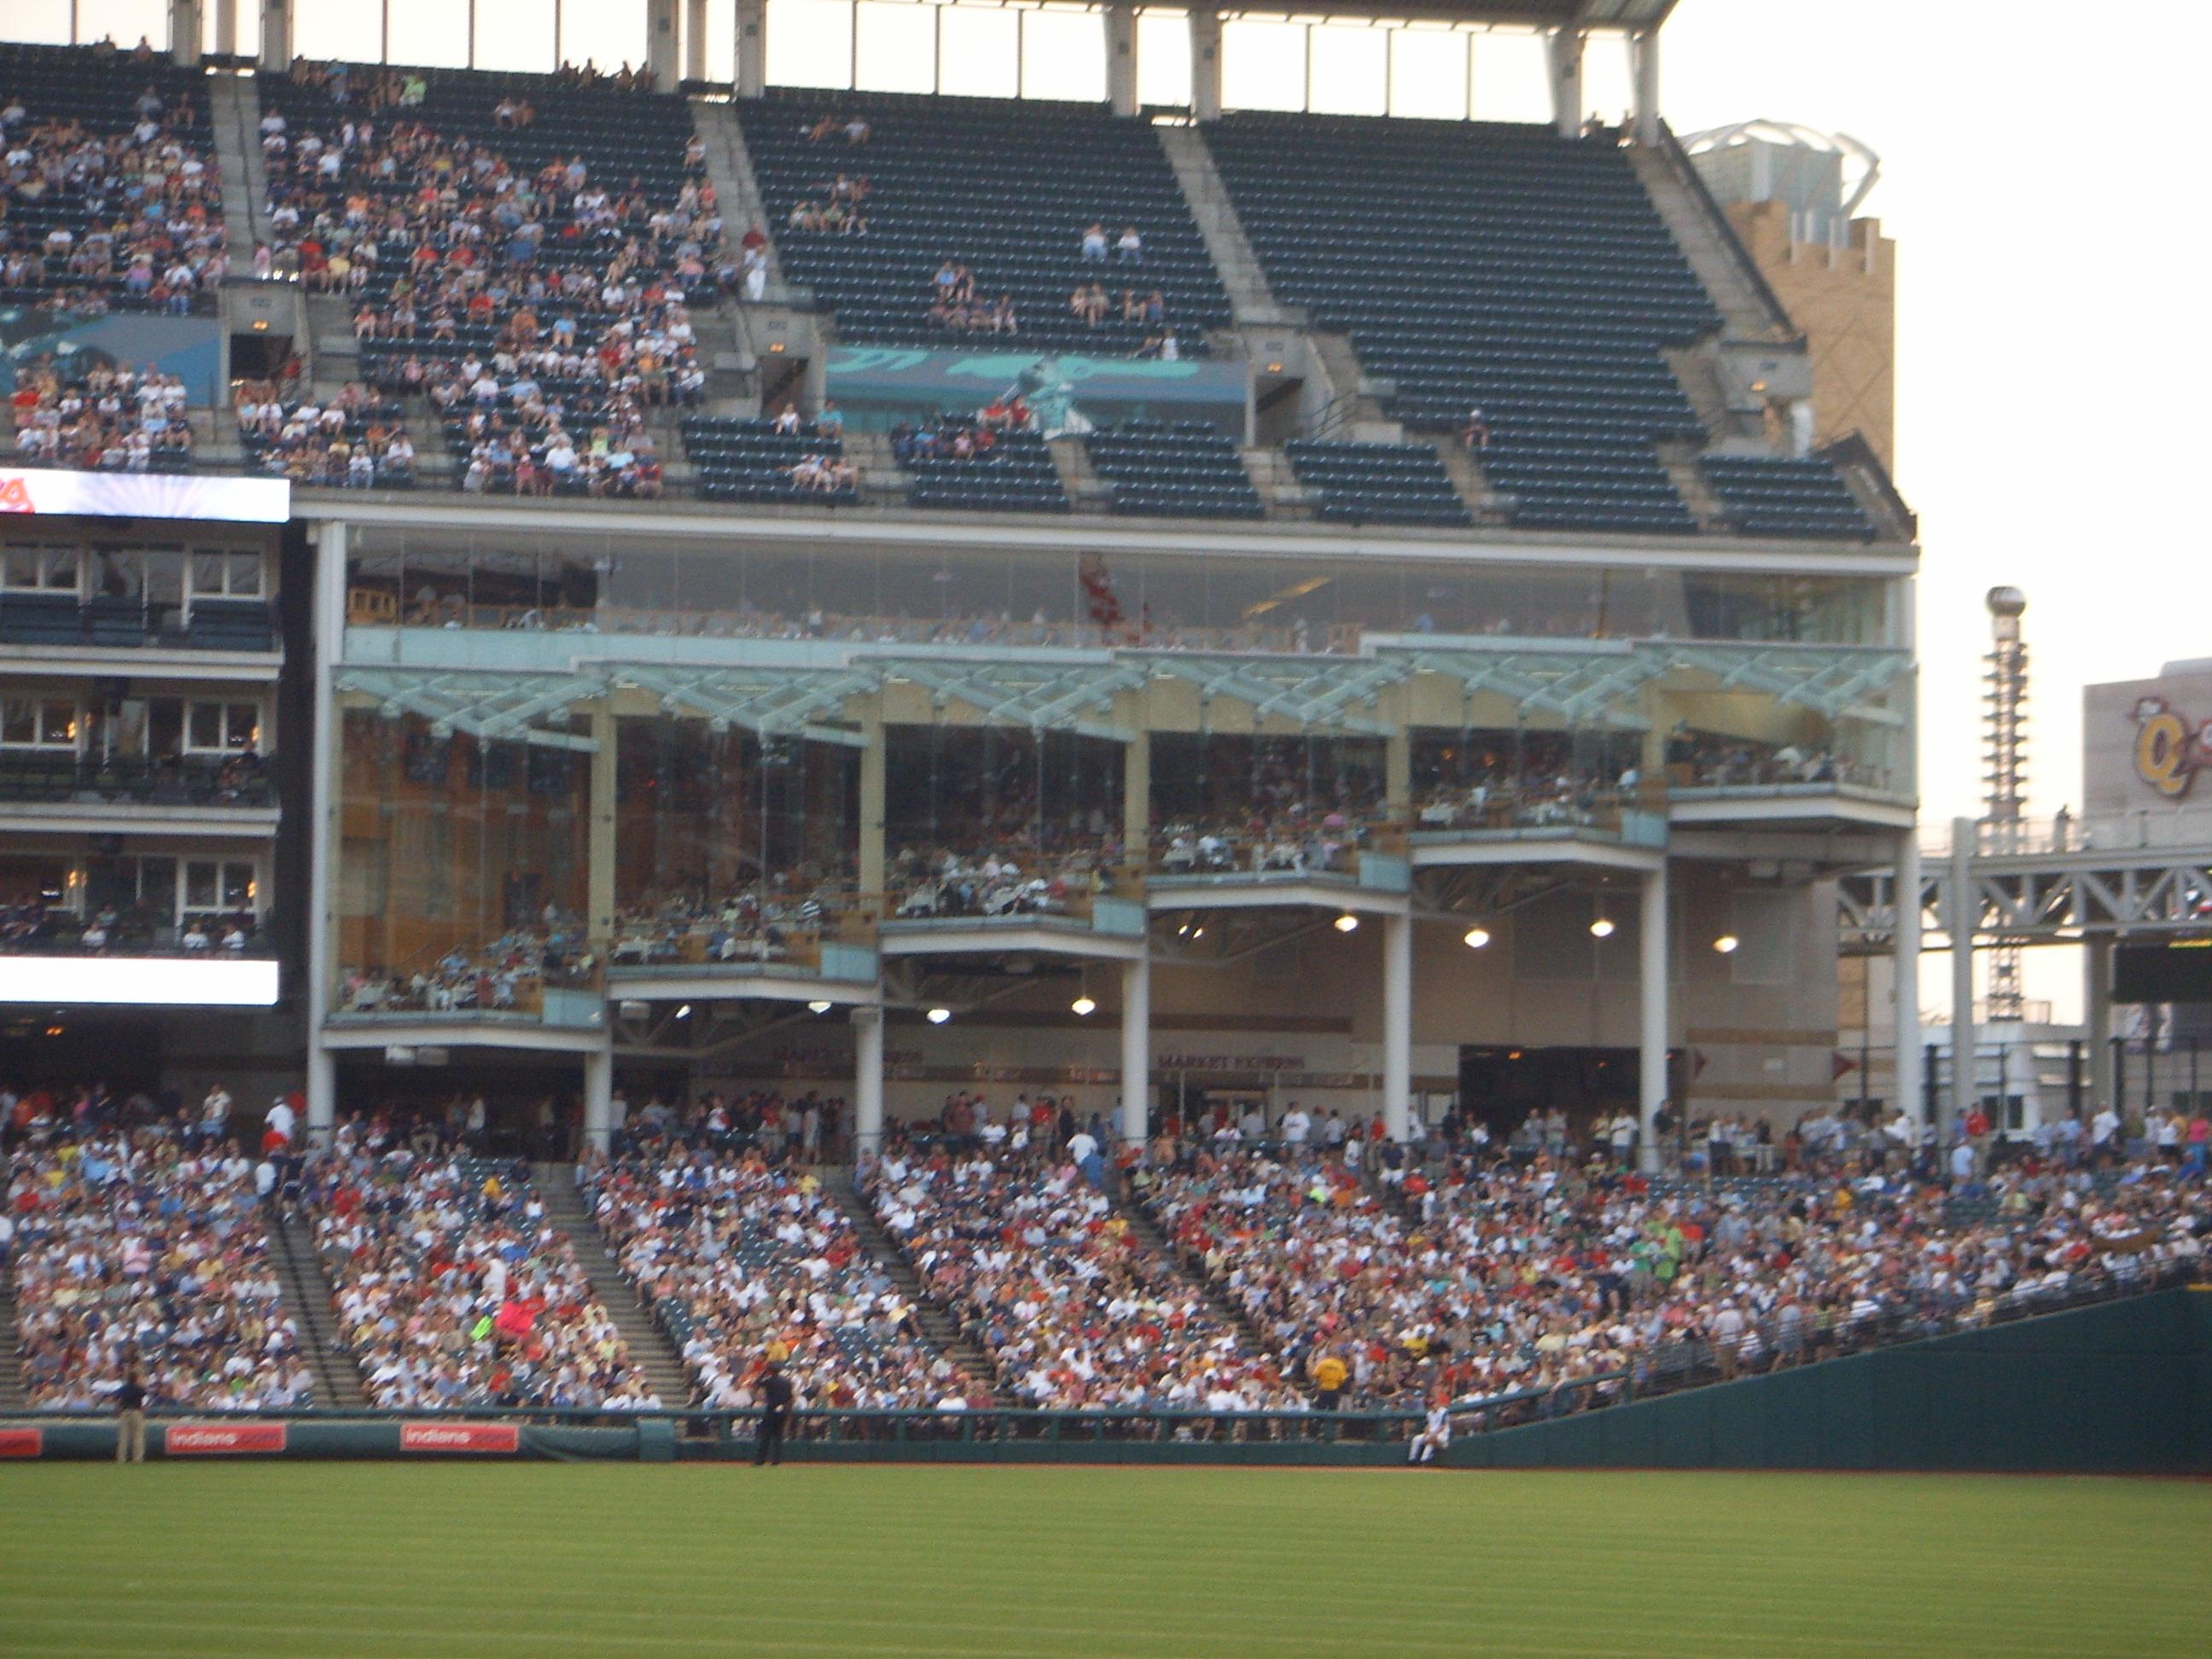 Ballparks Jacobs Field